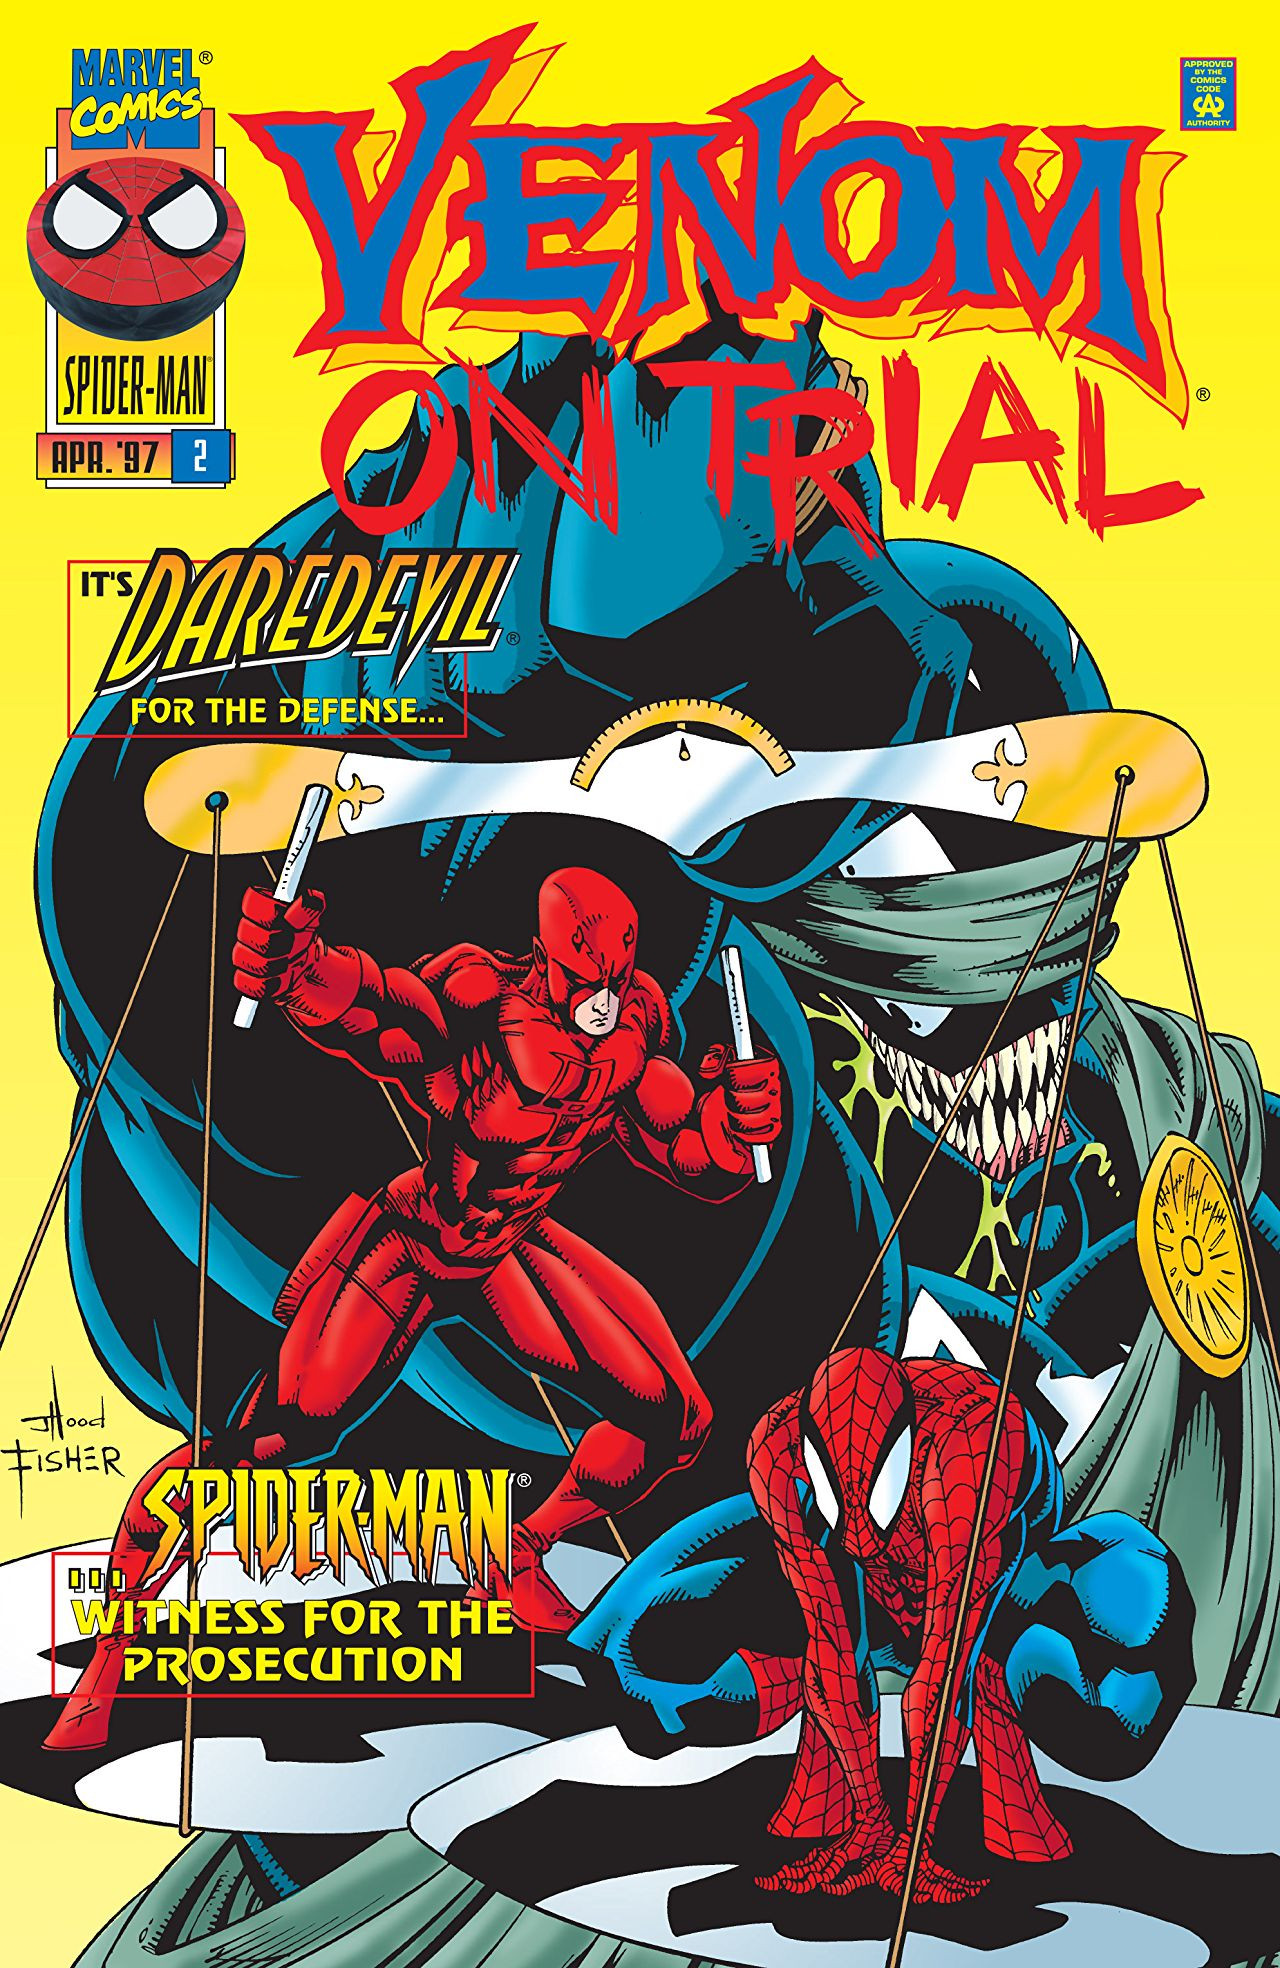 Venom on Trial Vol 1 2.jpg